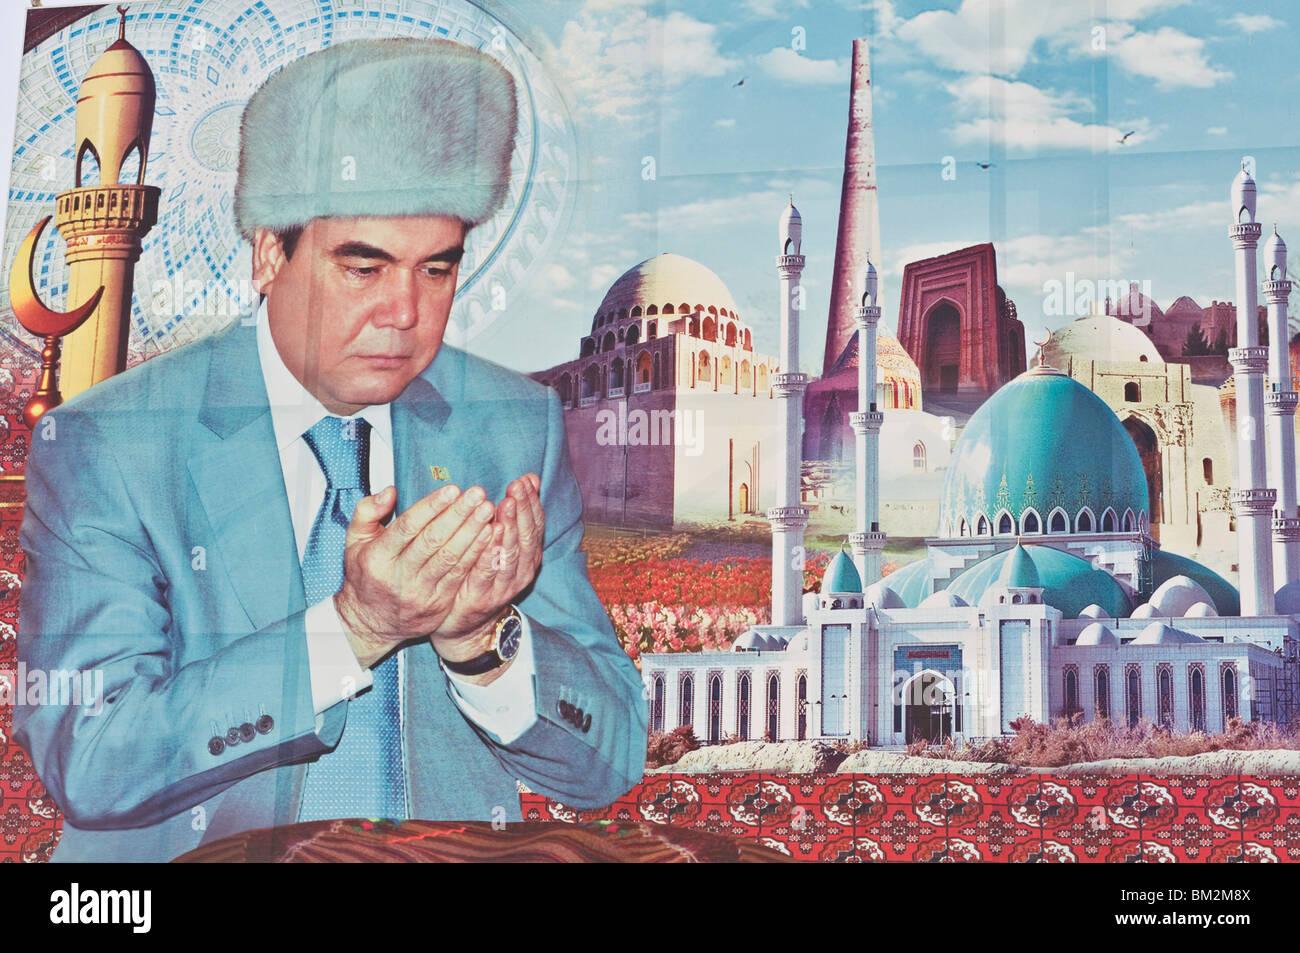 Propaganda poster of Turkmenbashi the former leader of Turkmenistan - Stock Image